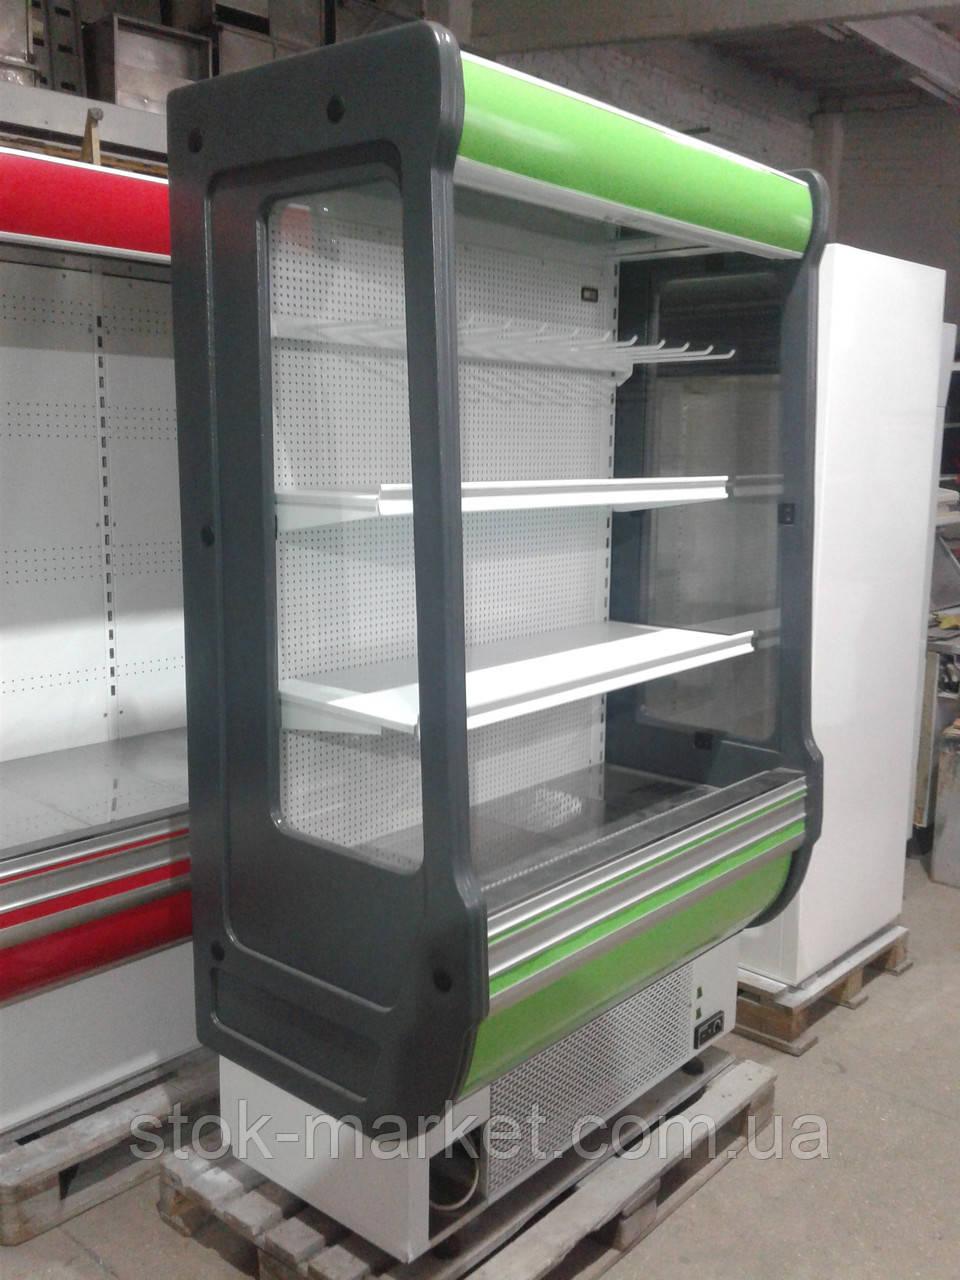 Холодильная горка Cold 1,24 м. б/у, холодильный регал б у, горка холодильная б у.